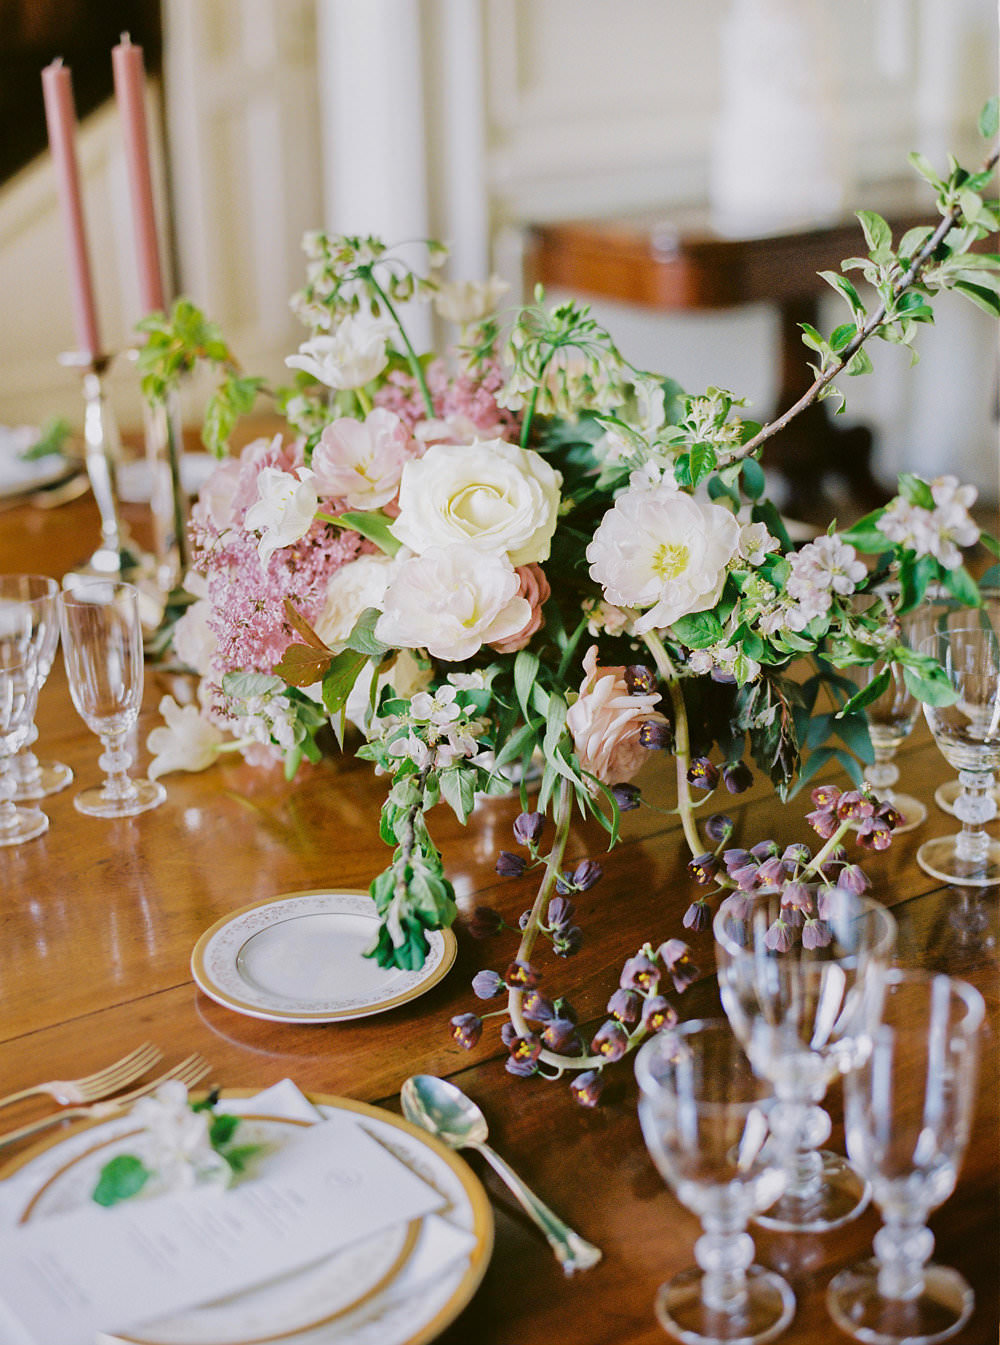 Table Setting 1930s Tableware Glasses Candlesticks Pink Flowers Floral Glamorous Vintage Eggington House Wedding Ideas David Jenkins Photography